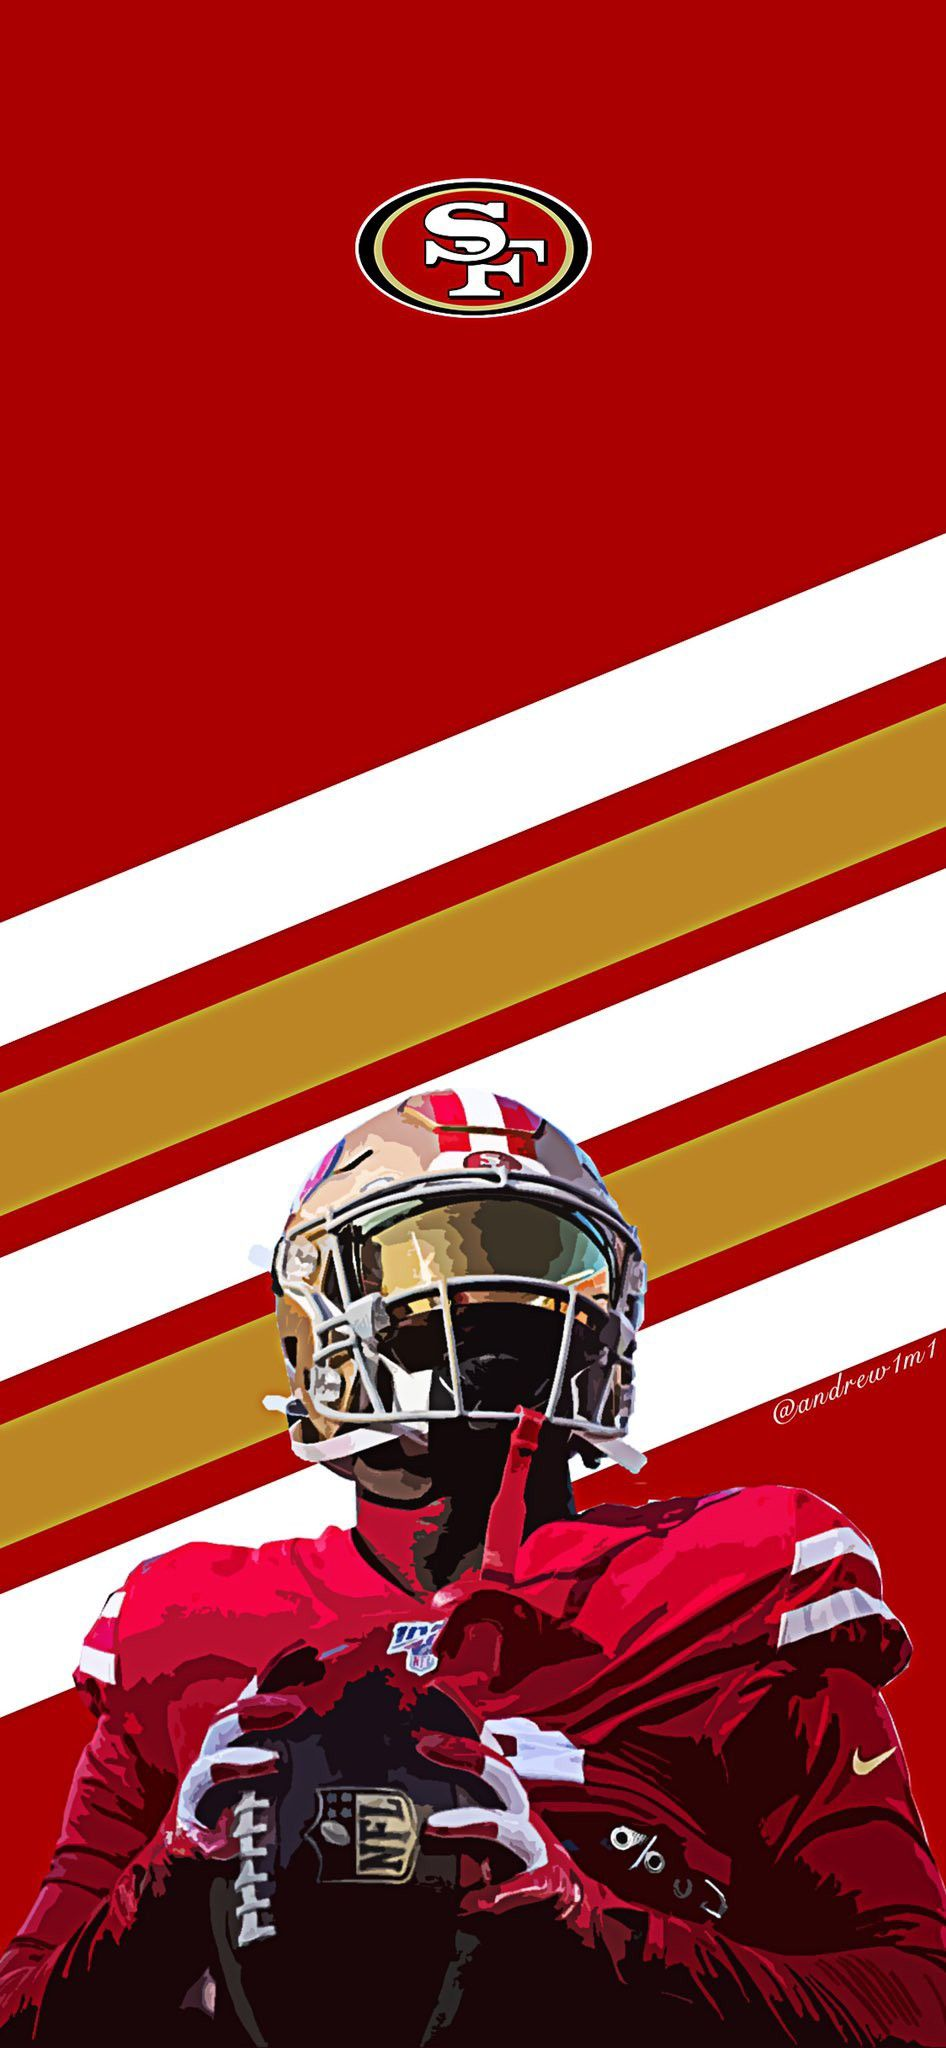 San Francisco 49ers Wallpaper San Francisco 49ers Sf Forty Niners San Francisco Forty Niners